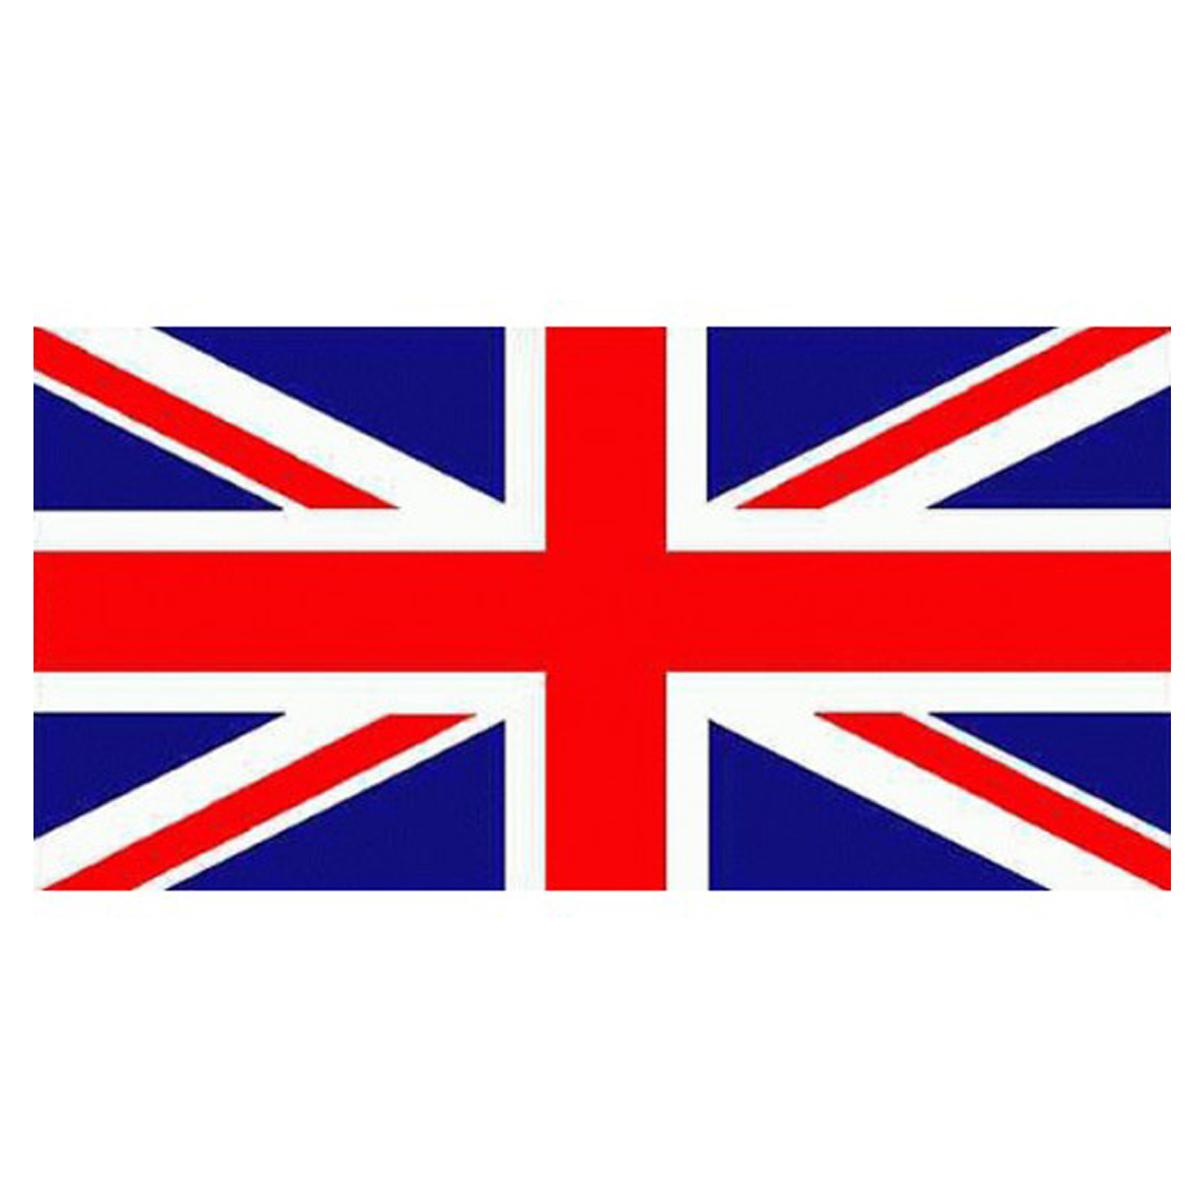 Drapeau \'Grande Bretagne\' union jack - 90x150 cm - [J1618]